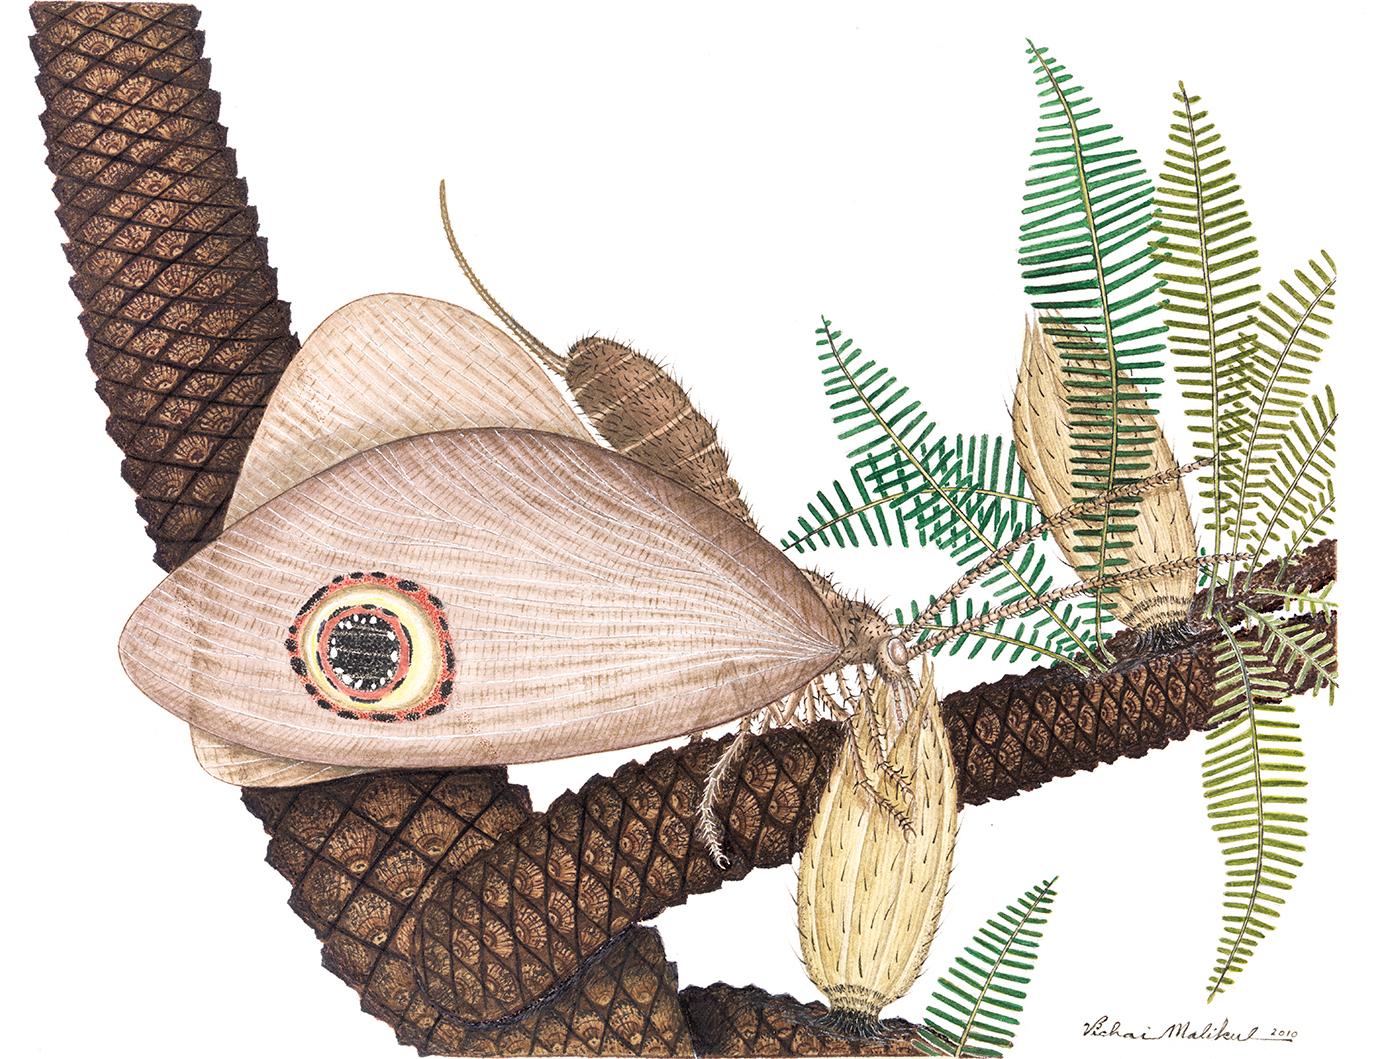 tywkiwdbi tai wiki widbee  jurassic lacewing vs modern butterfly